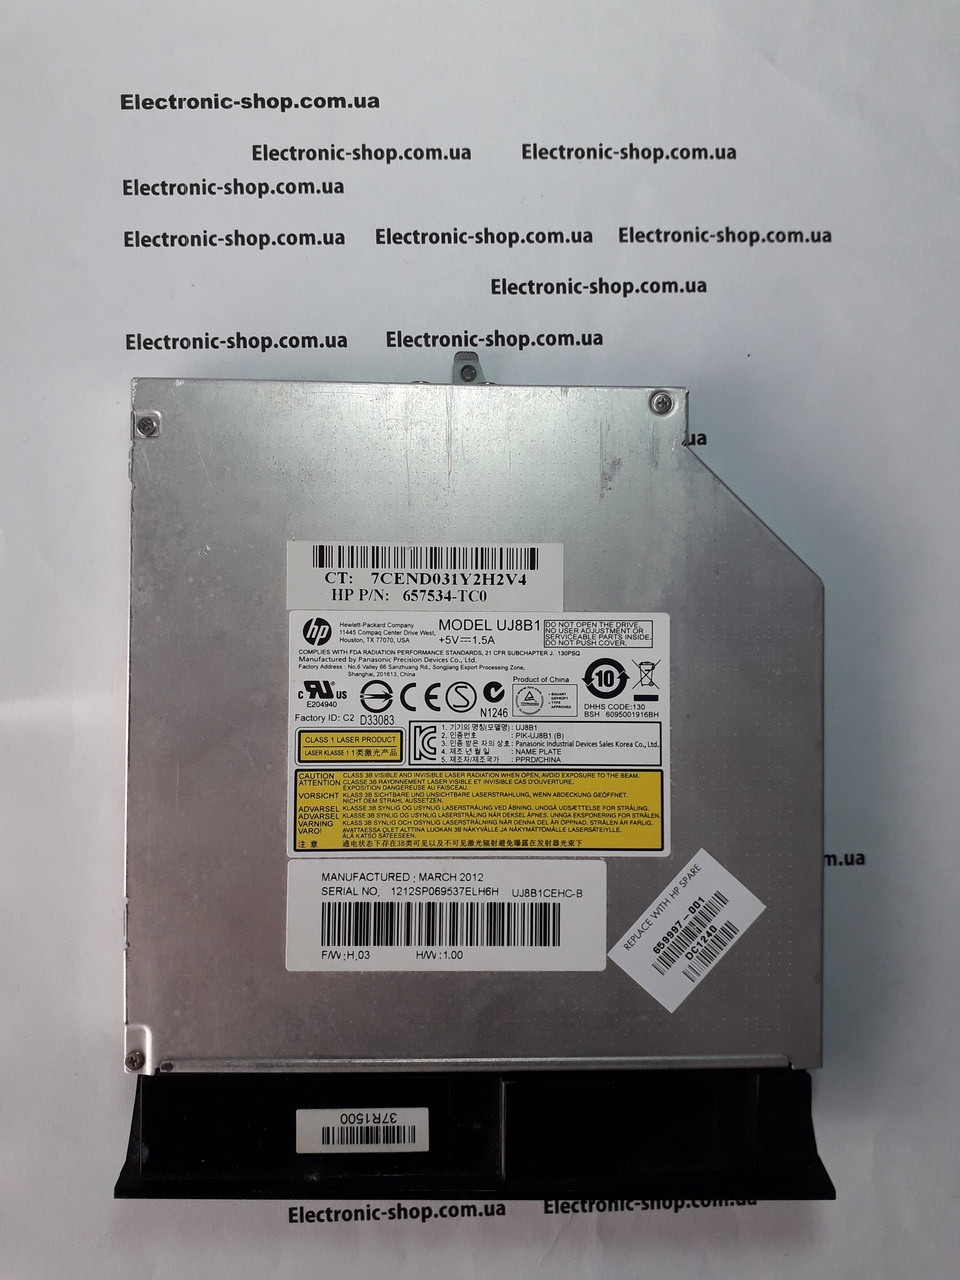 DVD привод  Sata Uj8B1  оригинал б.у.